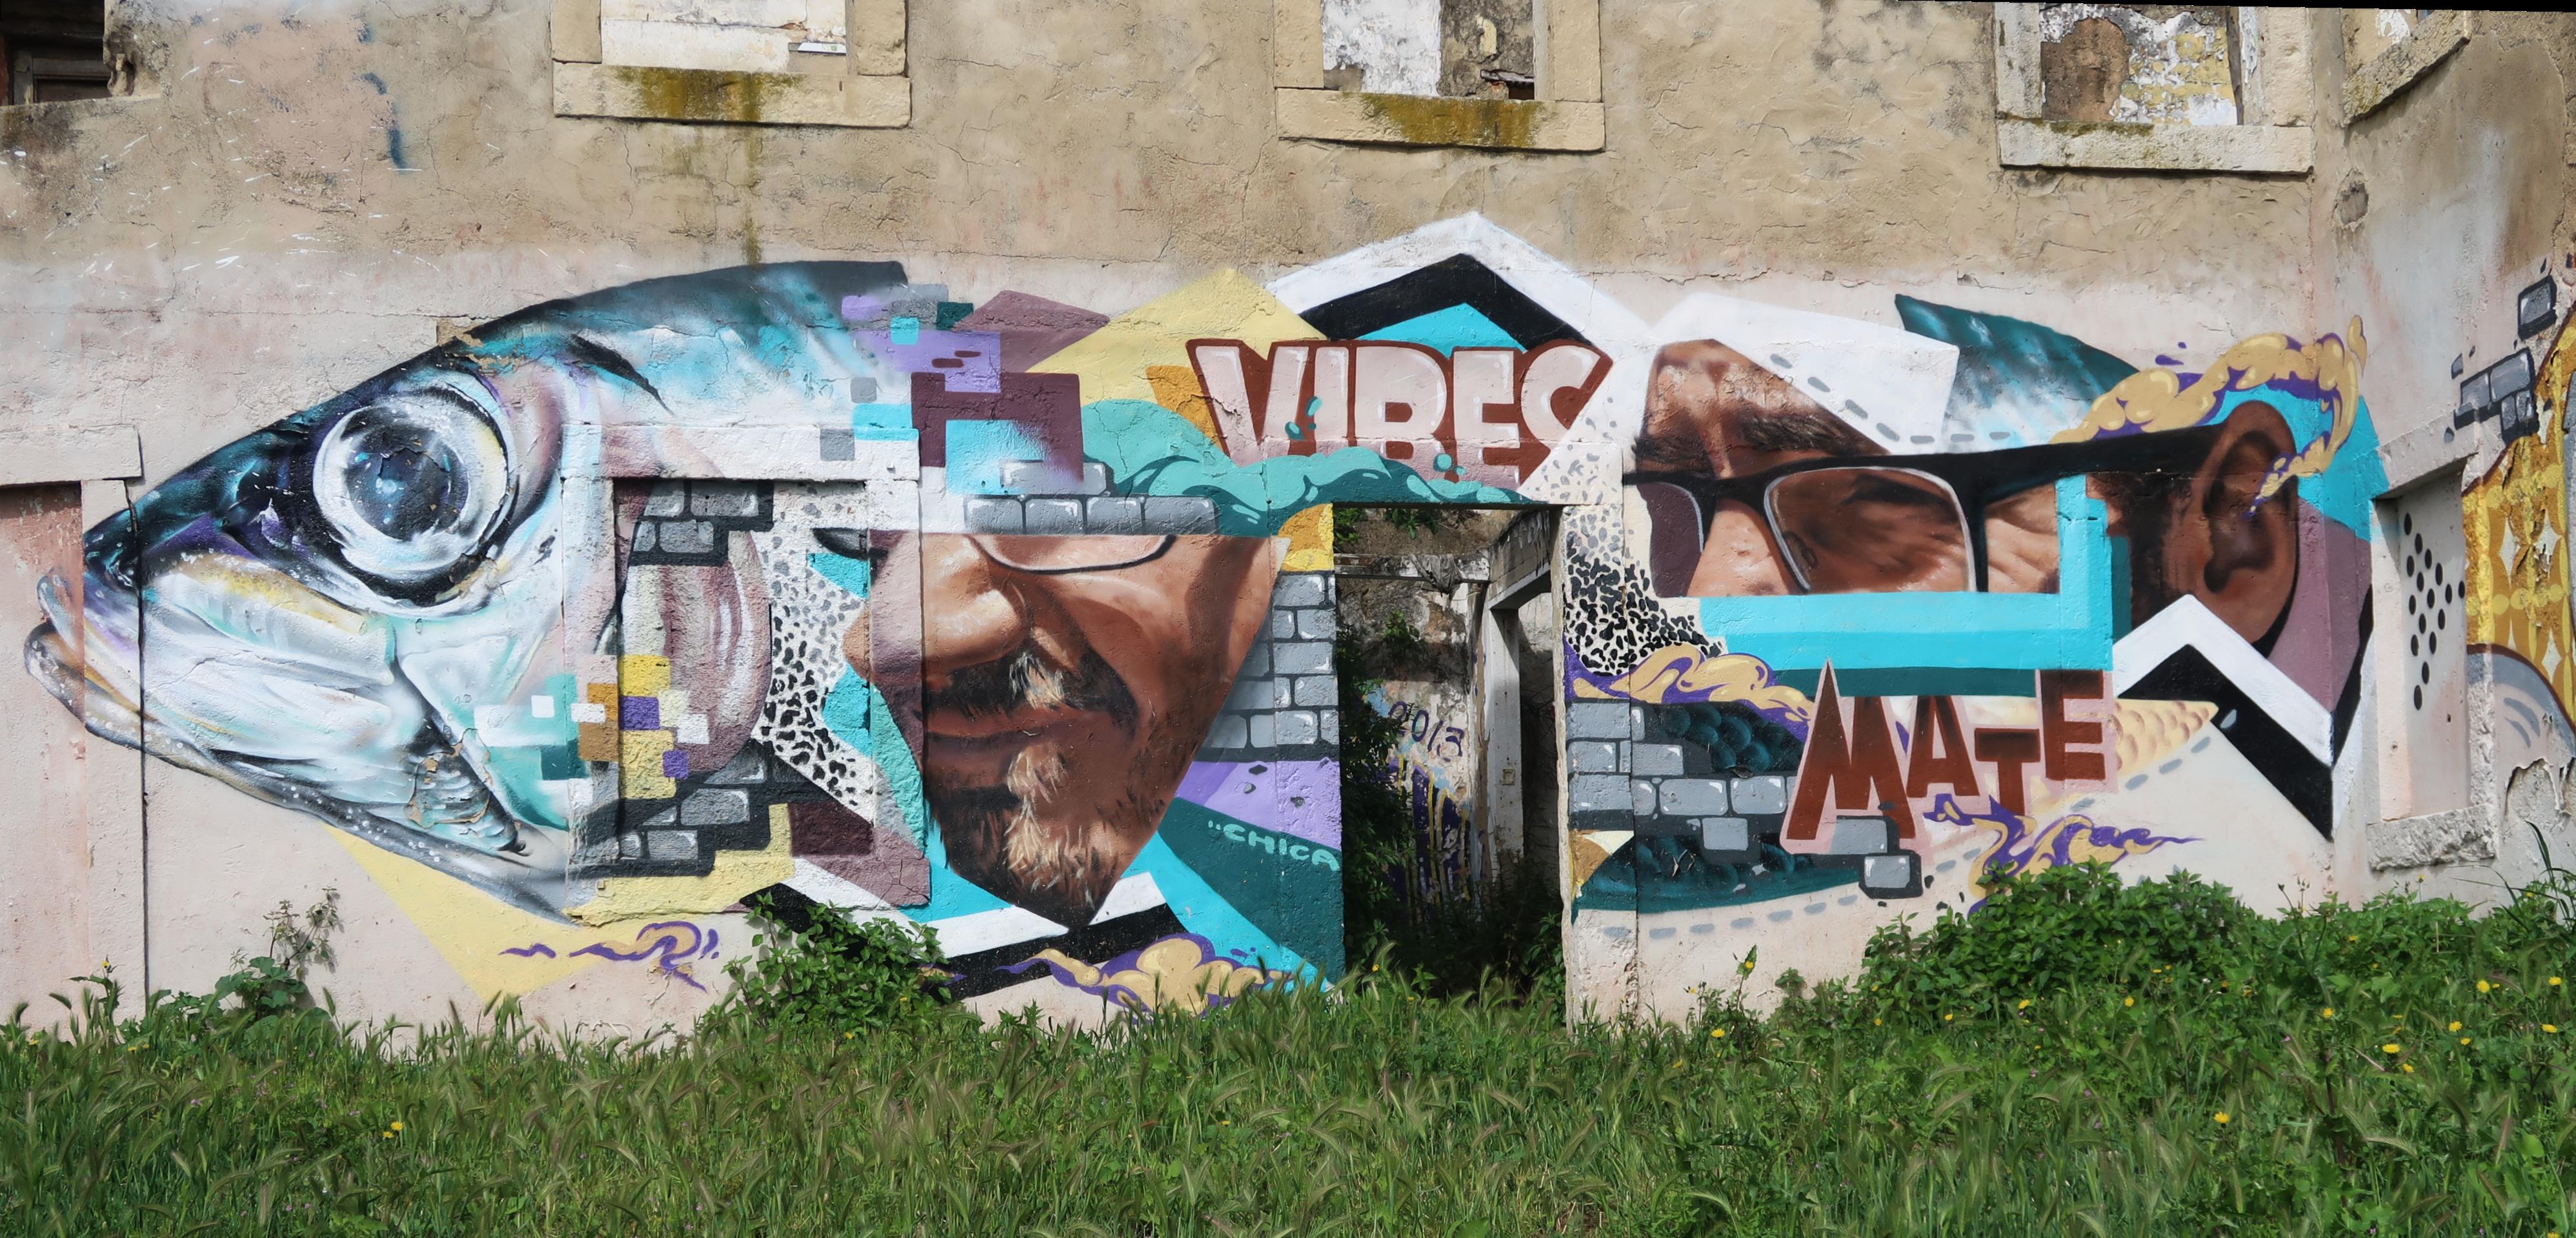 I Went To Lisbon An Street Art Was Everywhere!